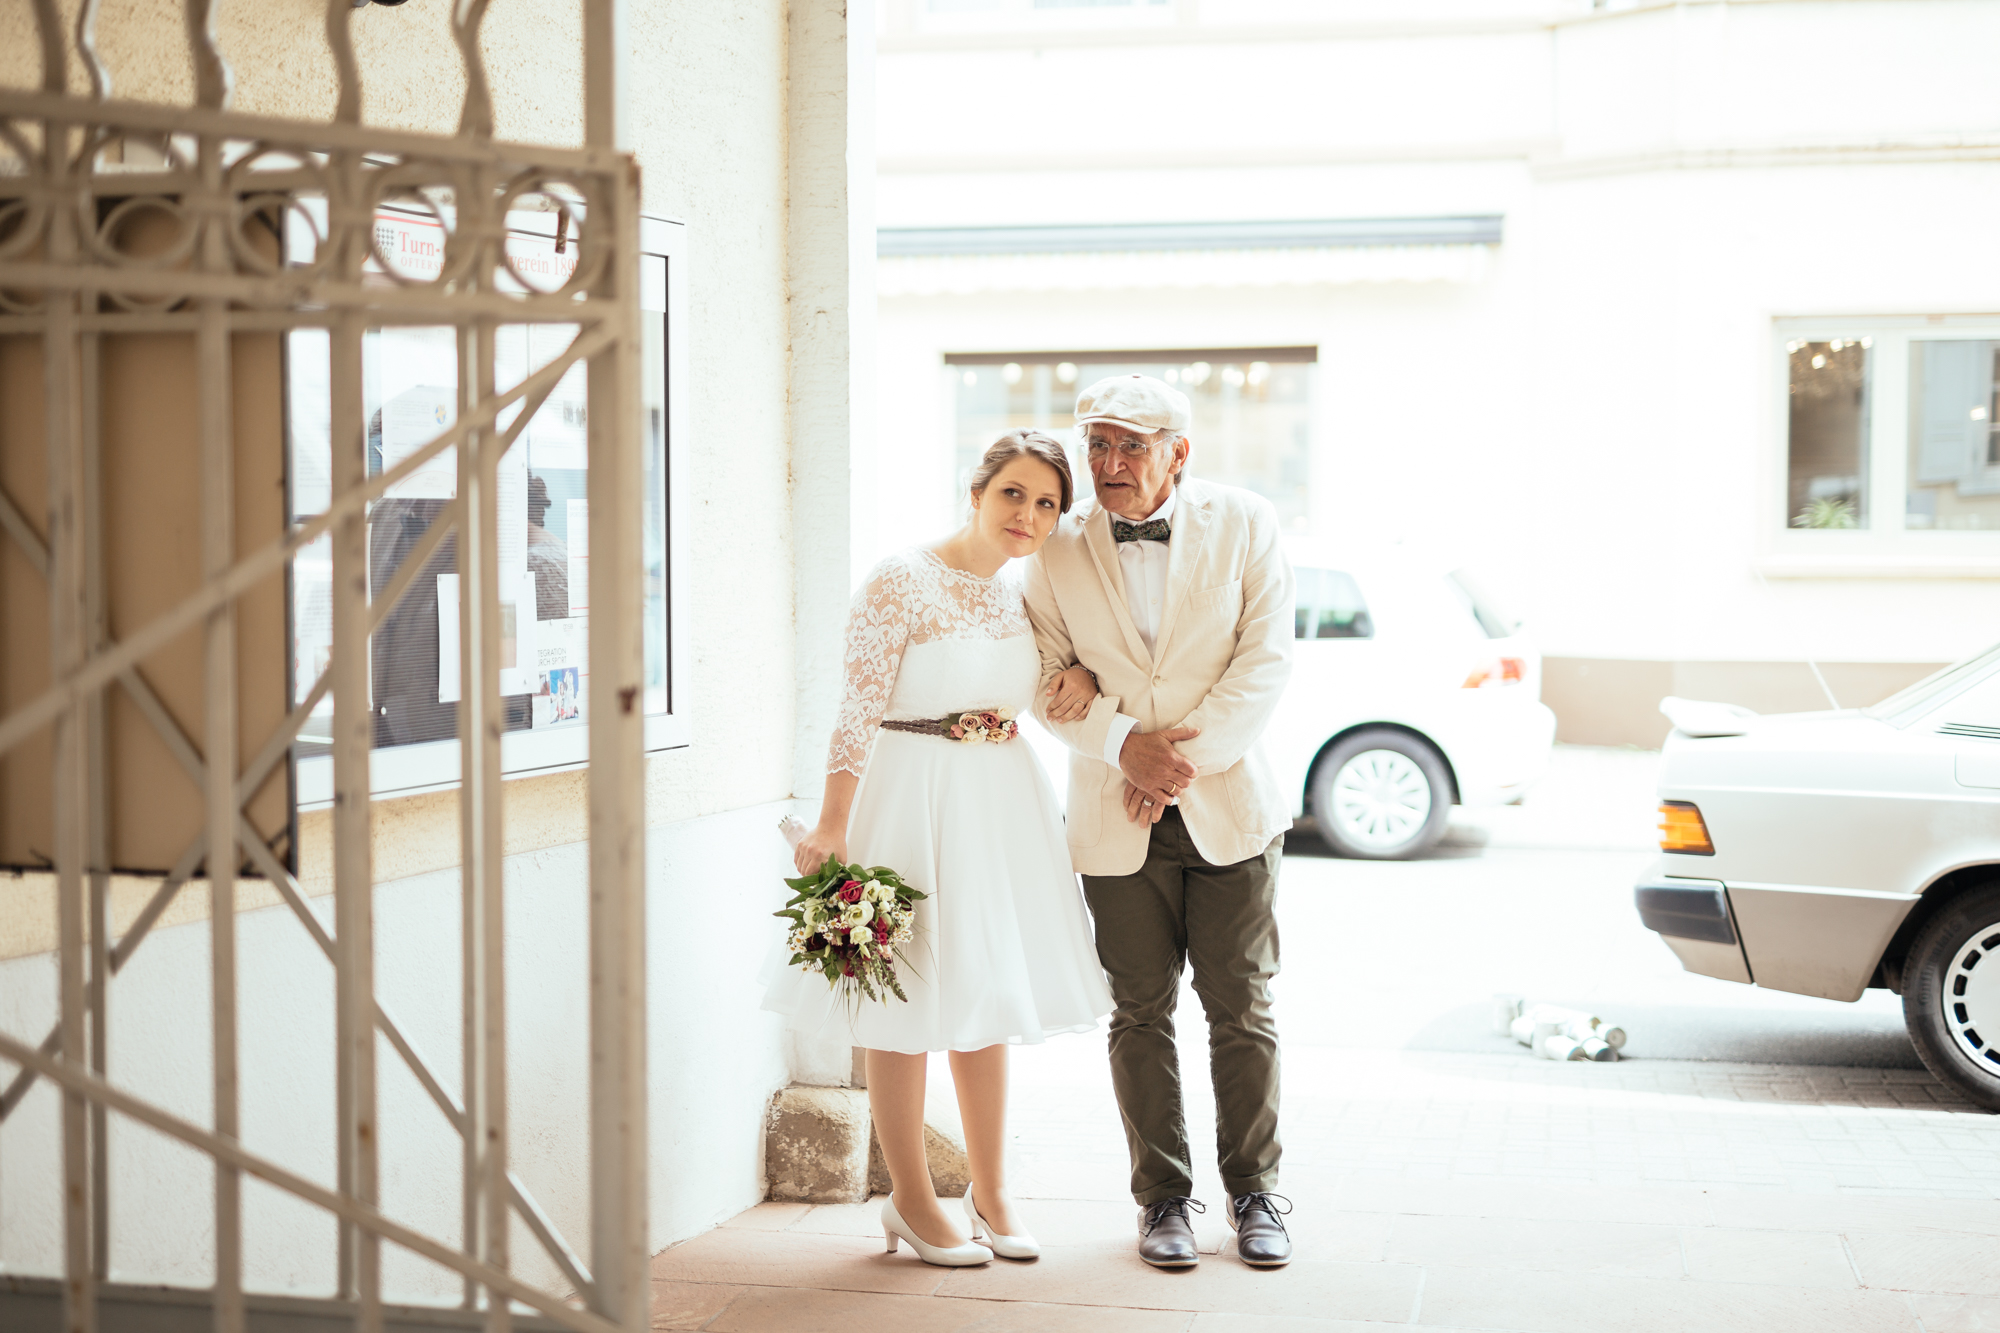 Brautvater und Braut